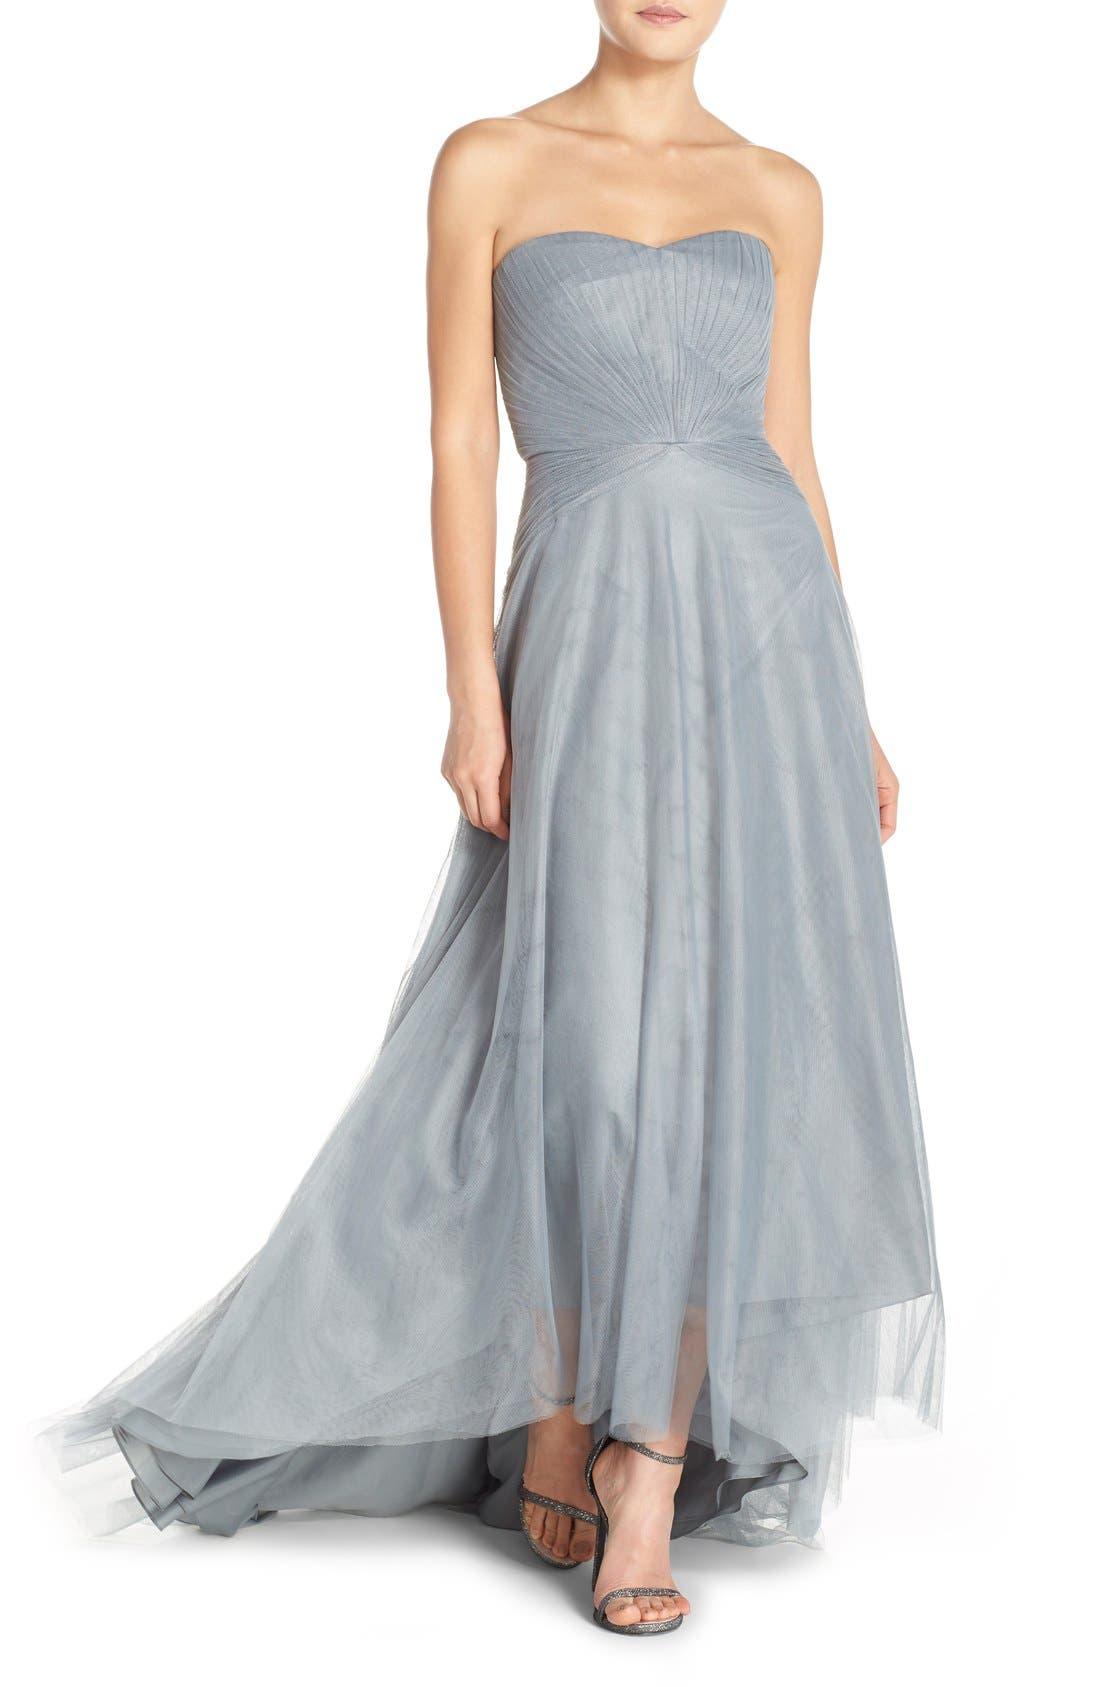 Alternate Image 1 Selected - Monique Lhuillier Bridesmaids Pleat Tulle Strapless Gown